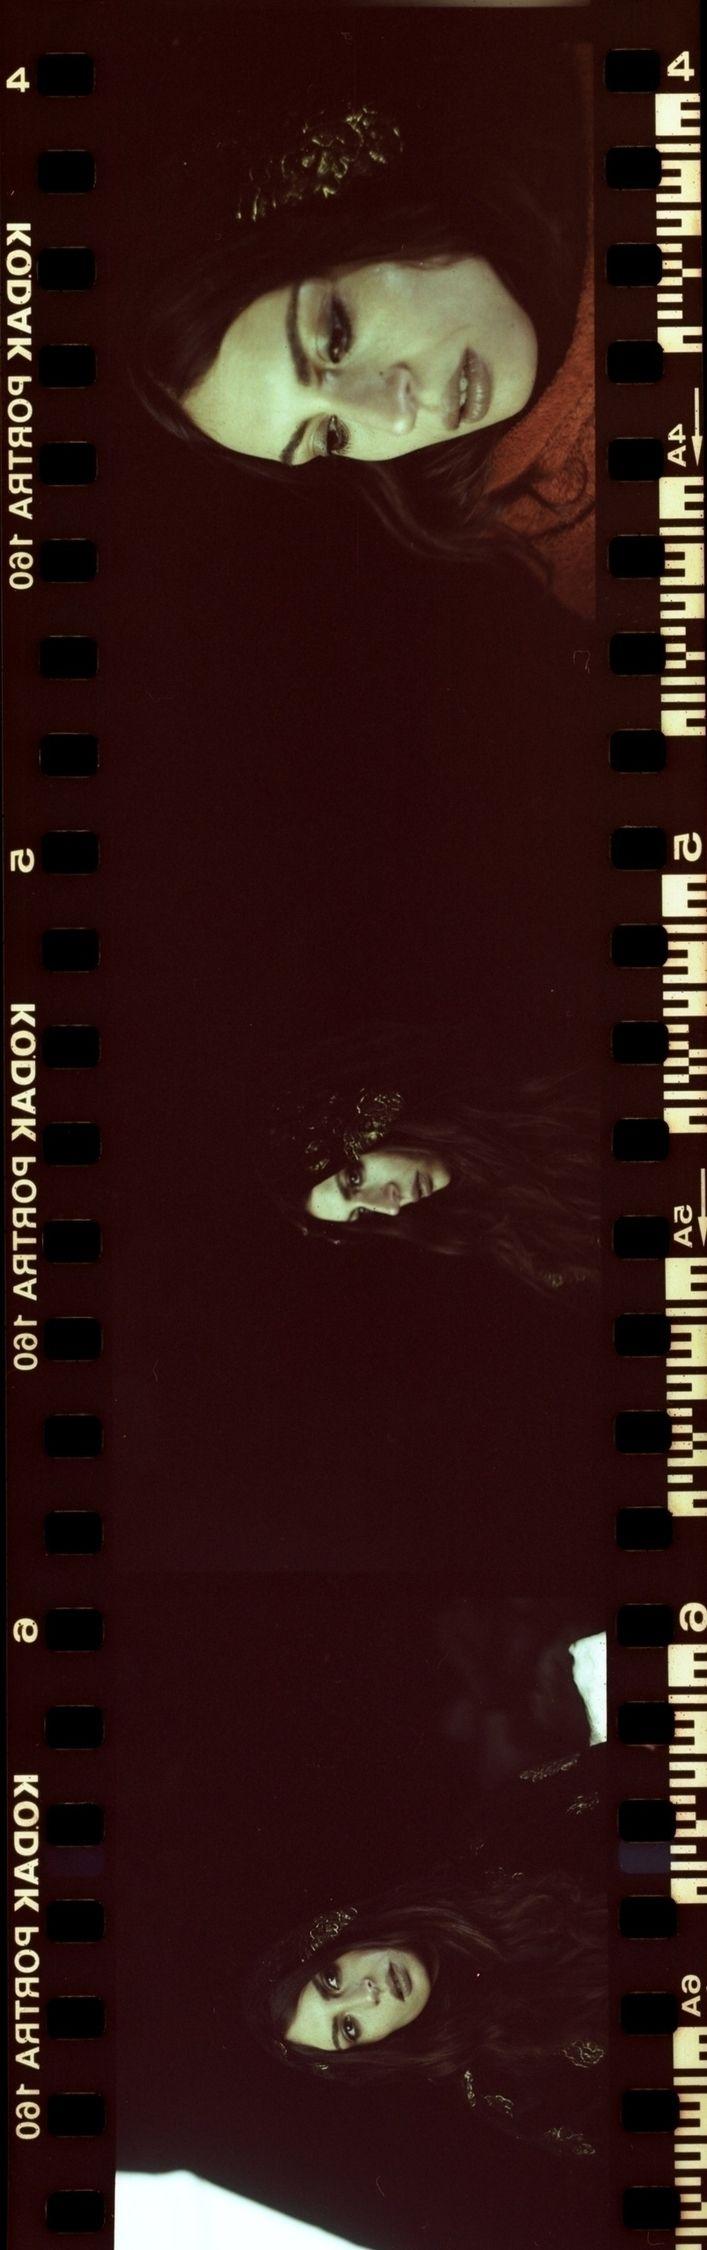 portrait night set - photography - cabra   ello